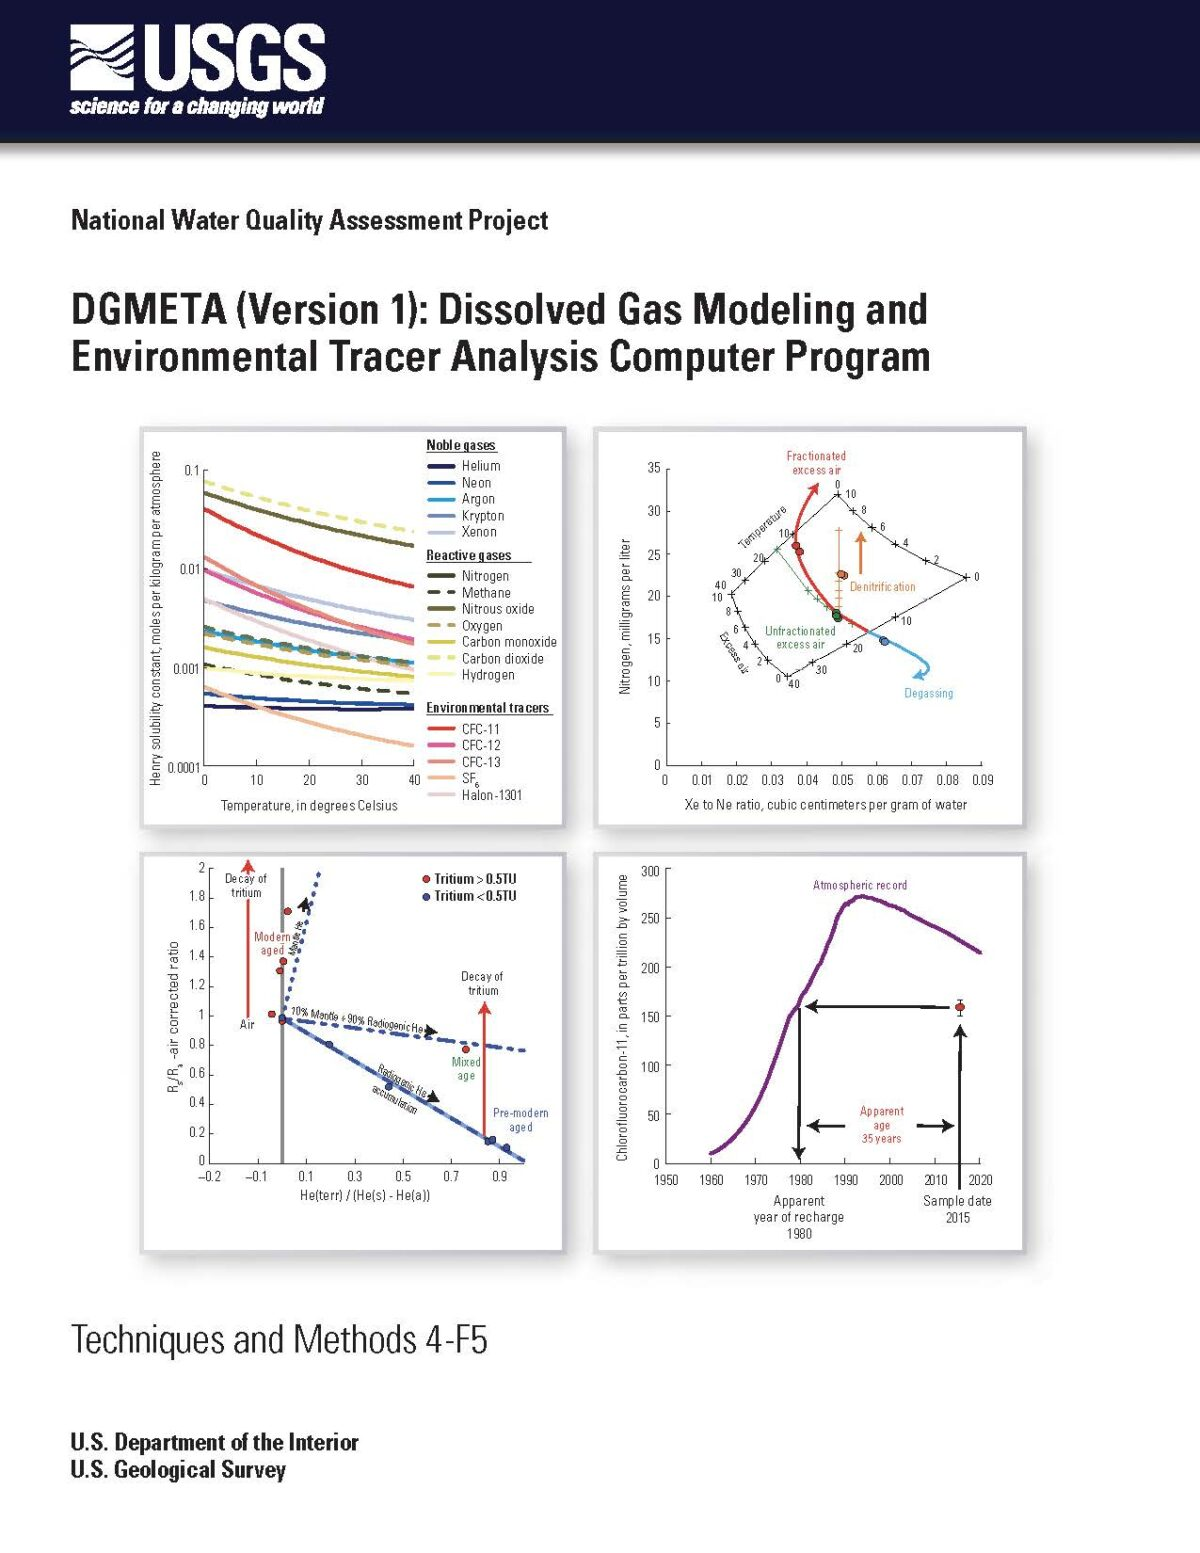 DGMETA (Version 1): Dissolved Gas Modeling and Environmental Tracer Analysis Computer Program